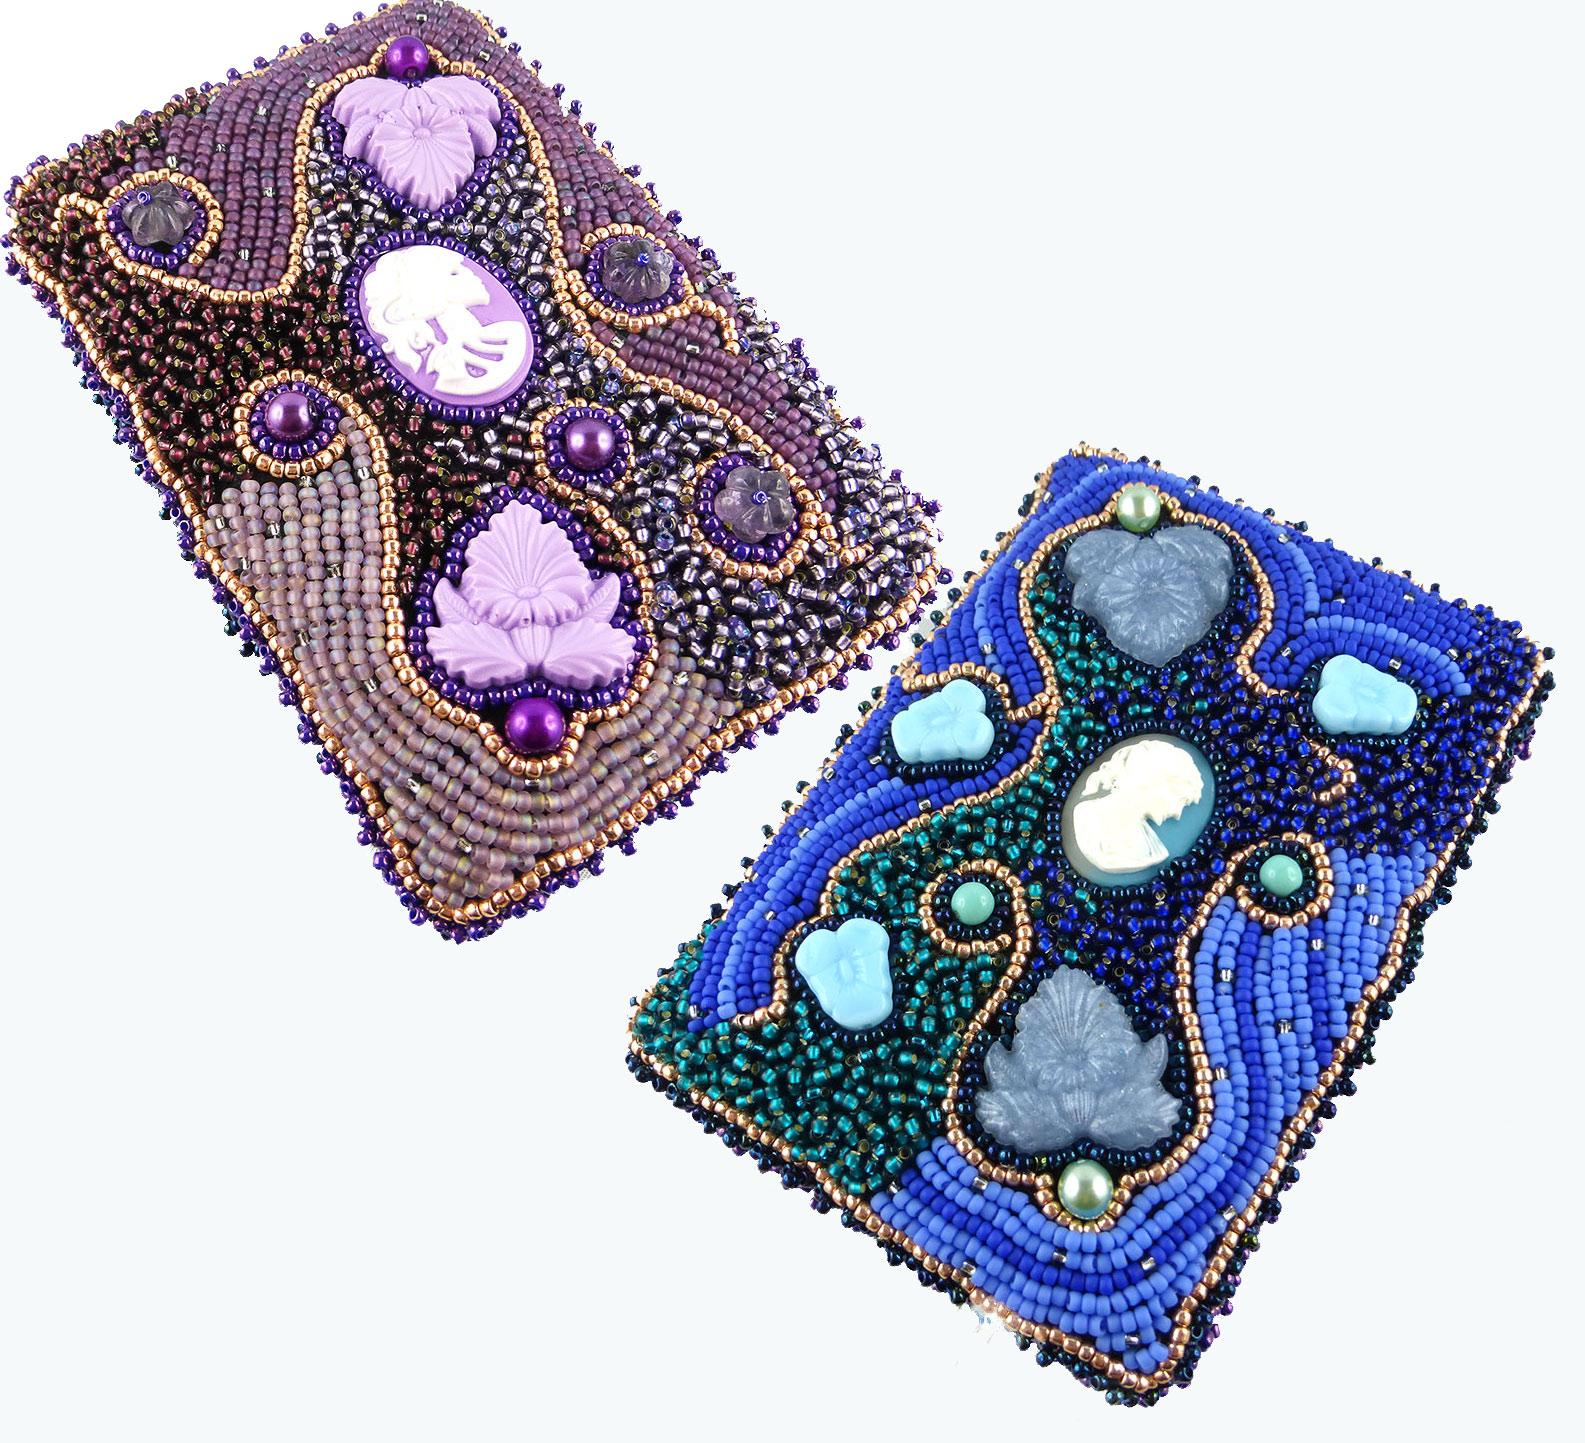 Etui, Visitenkartentasche, Ausweistasche, Bead Embroidery